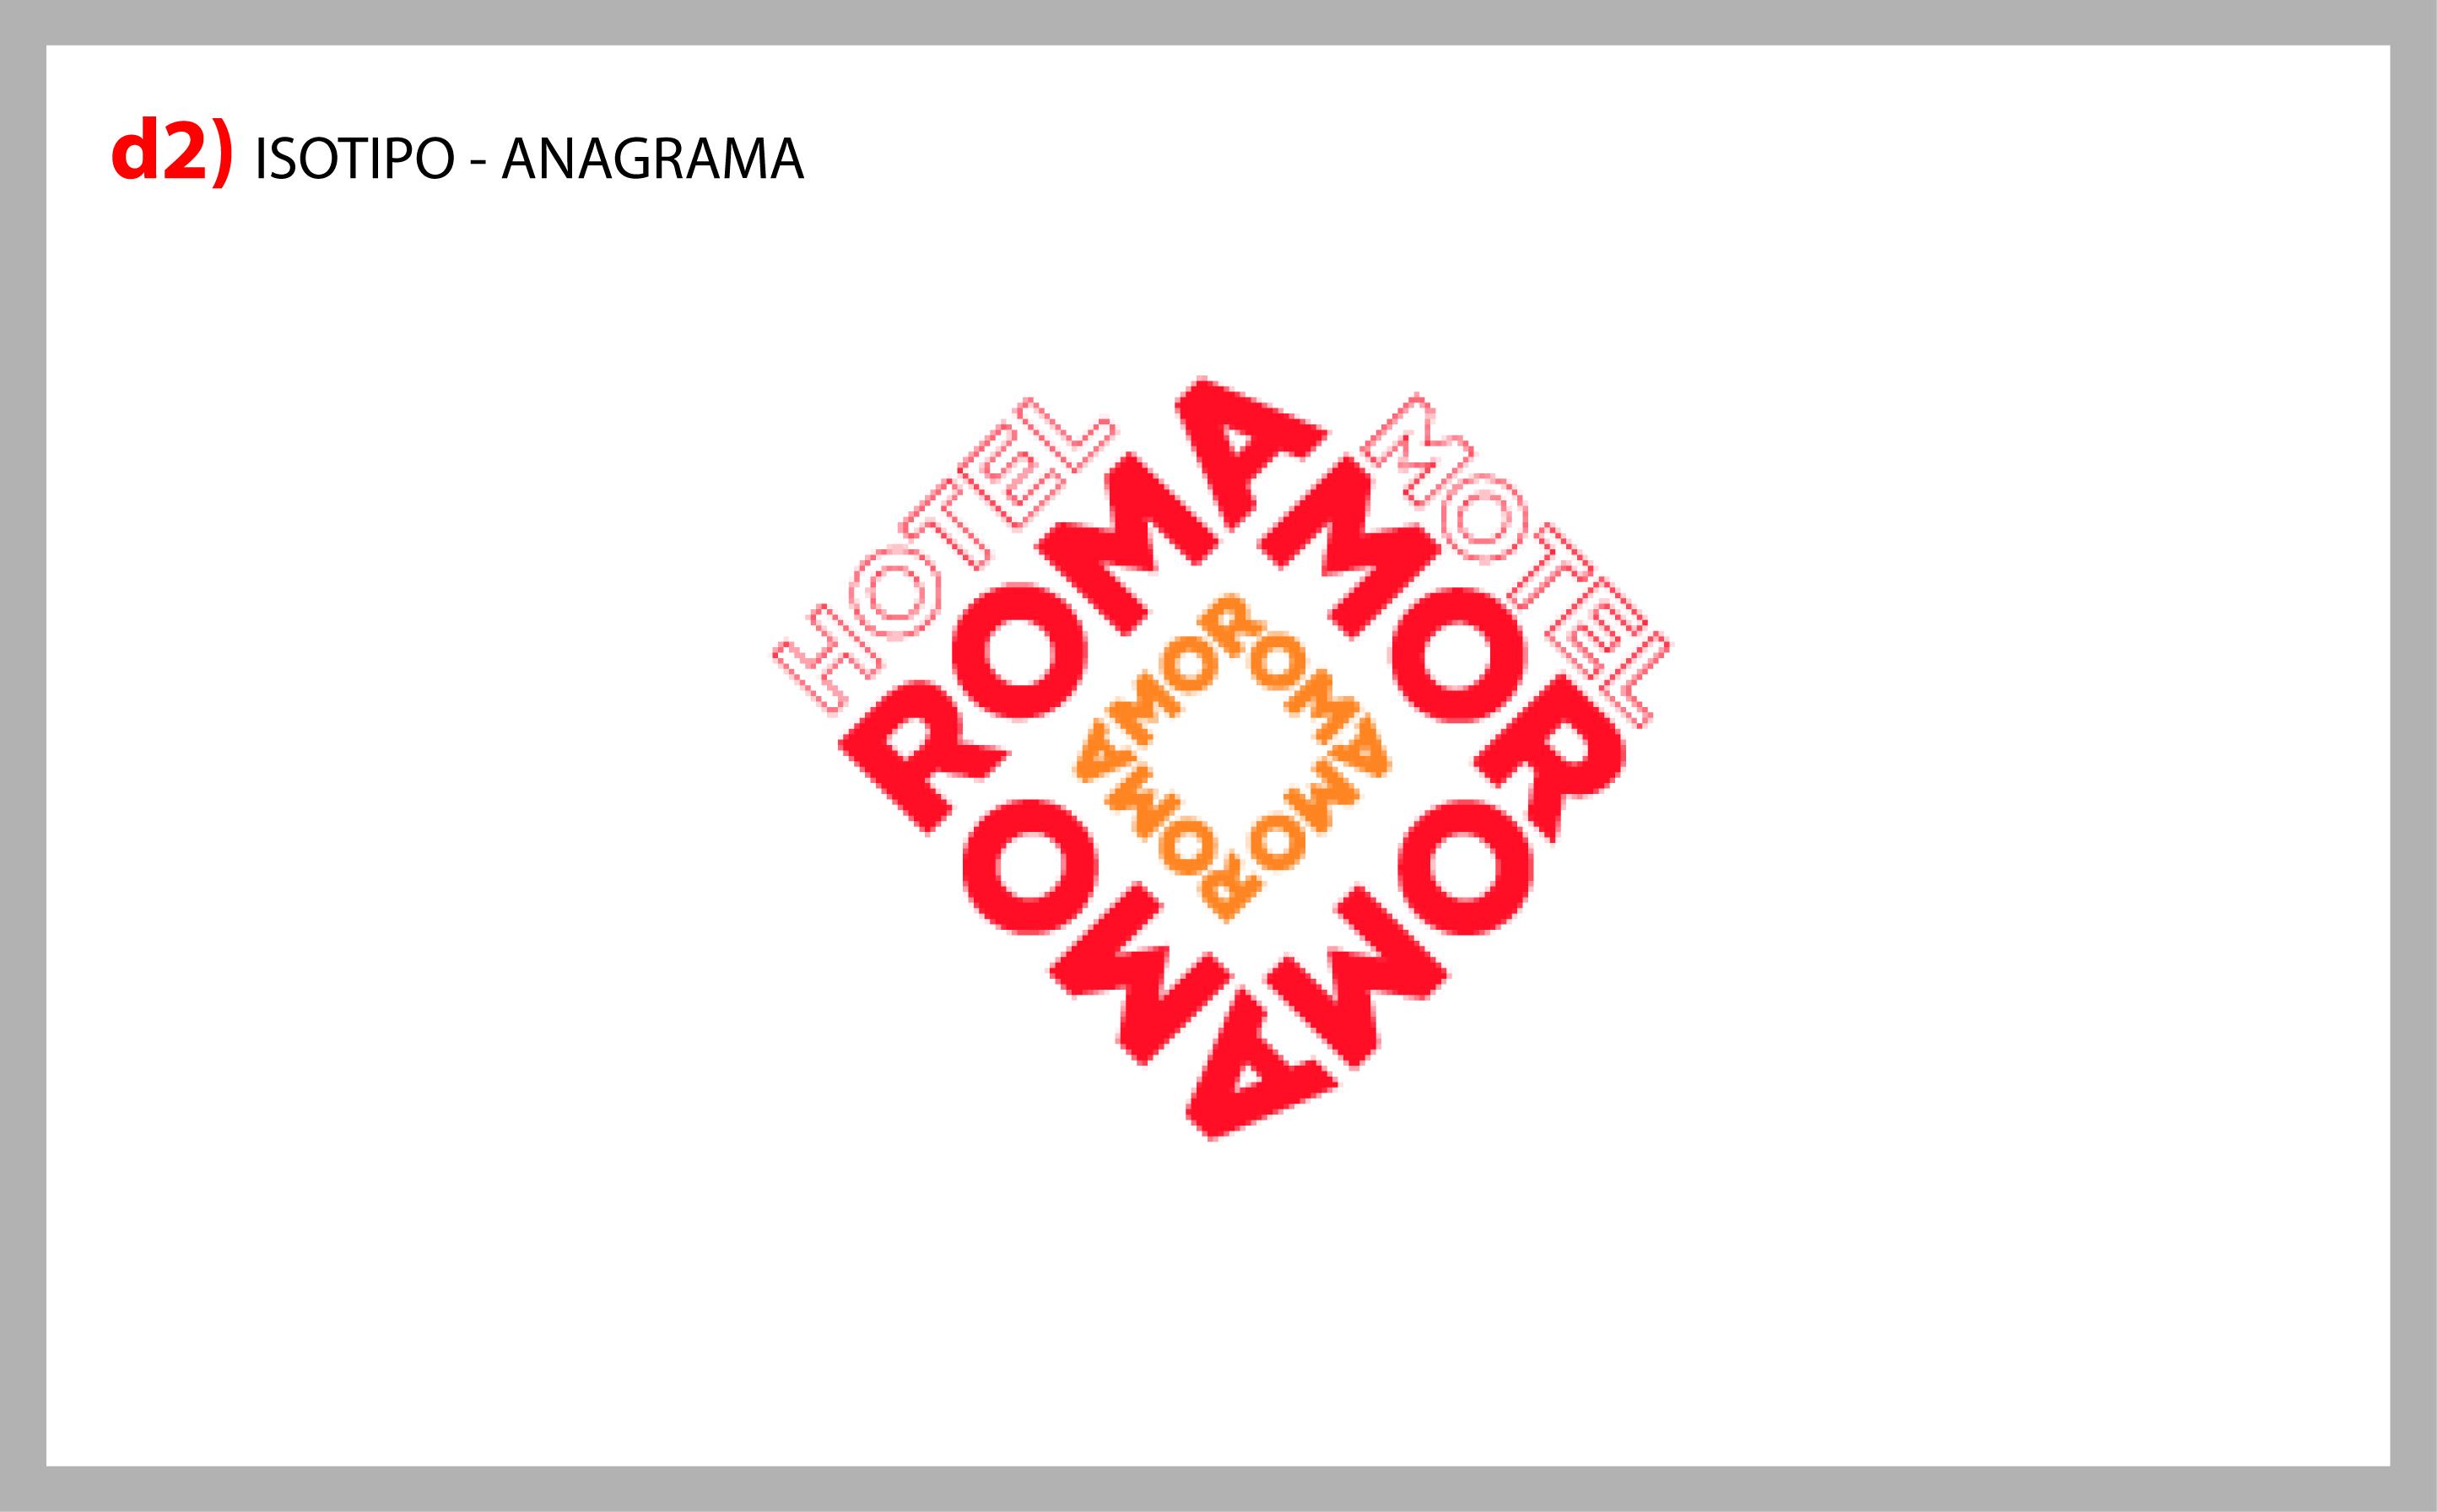 Anagrama